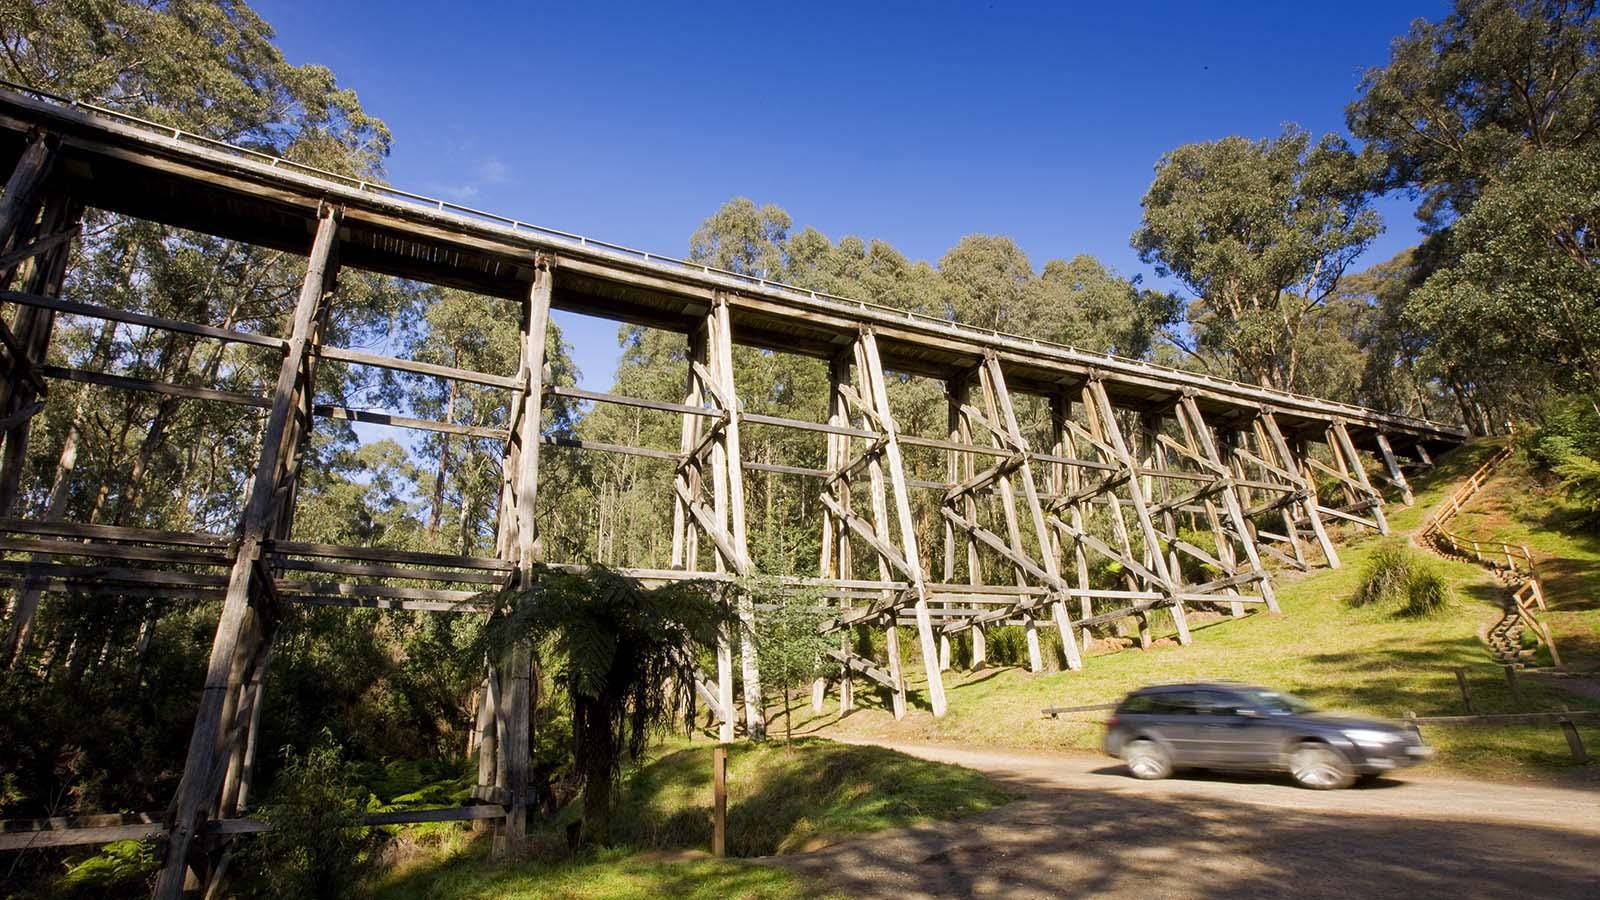 Noojee Trestle Bridge, Gippsland, Victoria, Australia